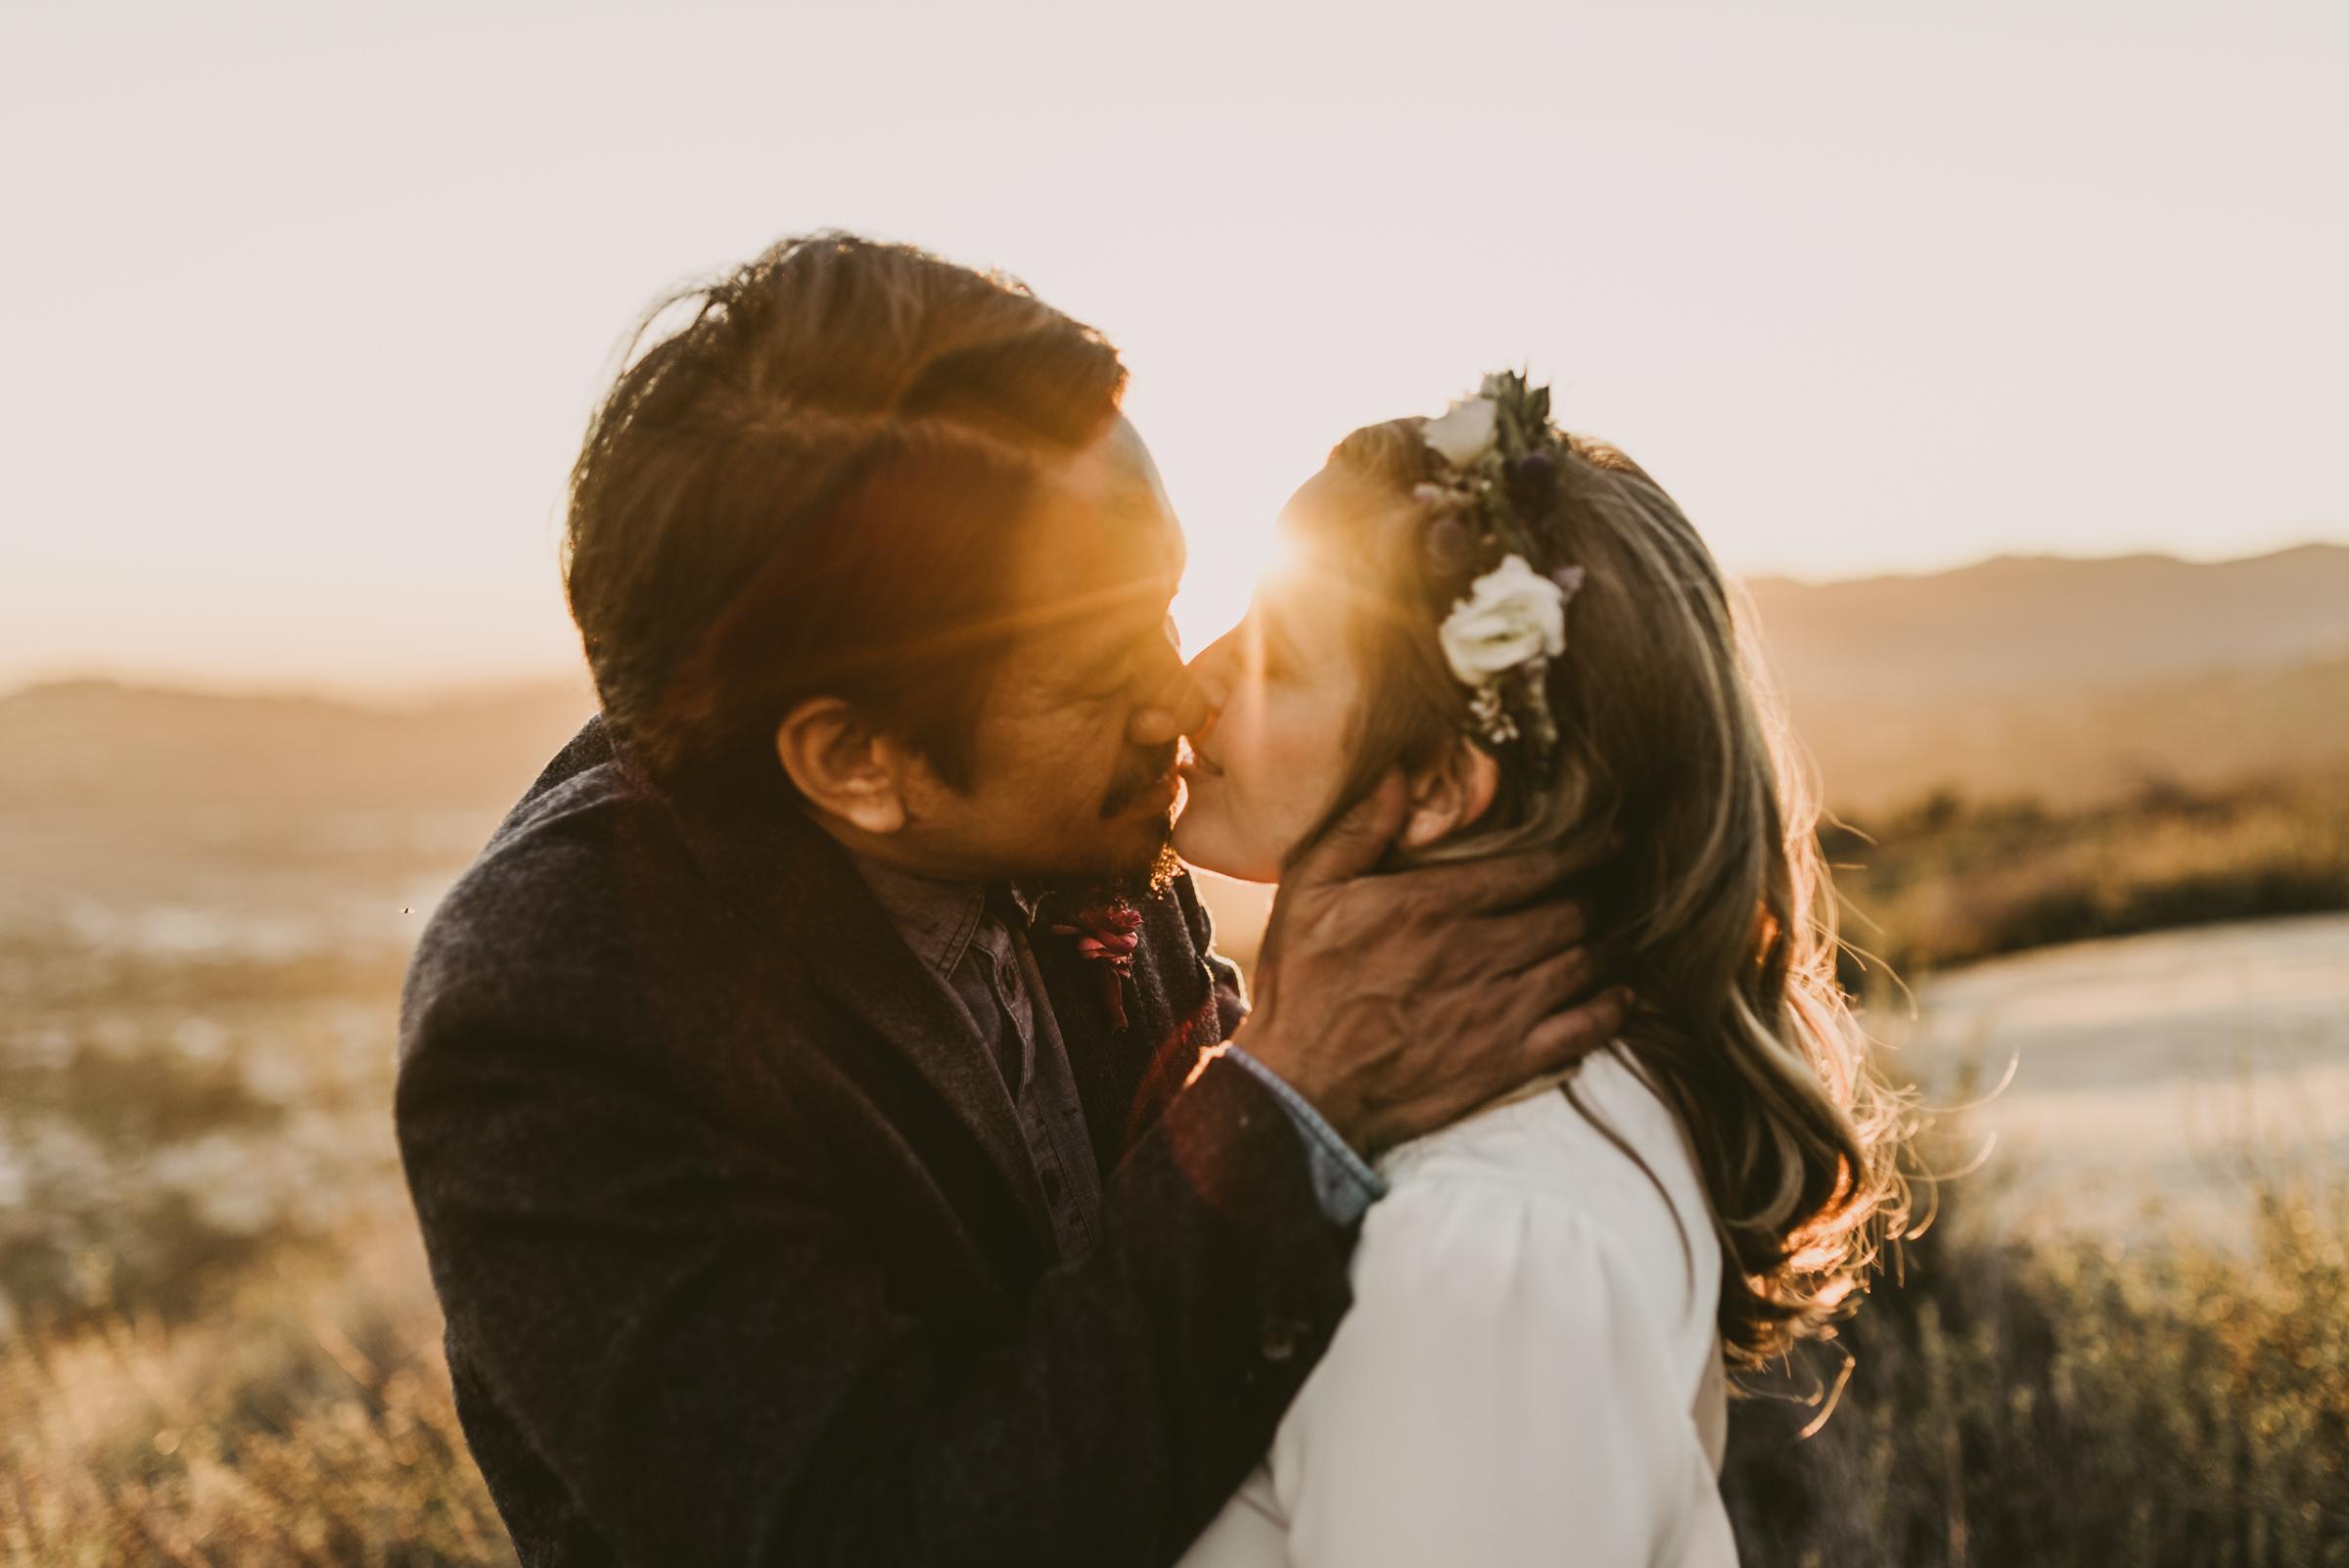 ©Isaiah + Taylor Photography - Intimate Elopement, Eaton Canyon, Los Angeles Wedding Photographer-89.jpg